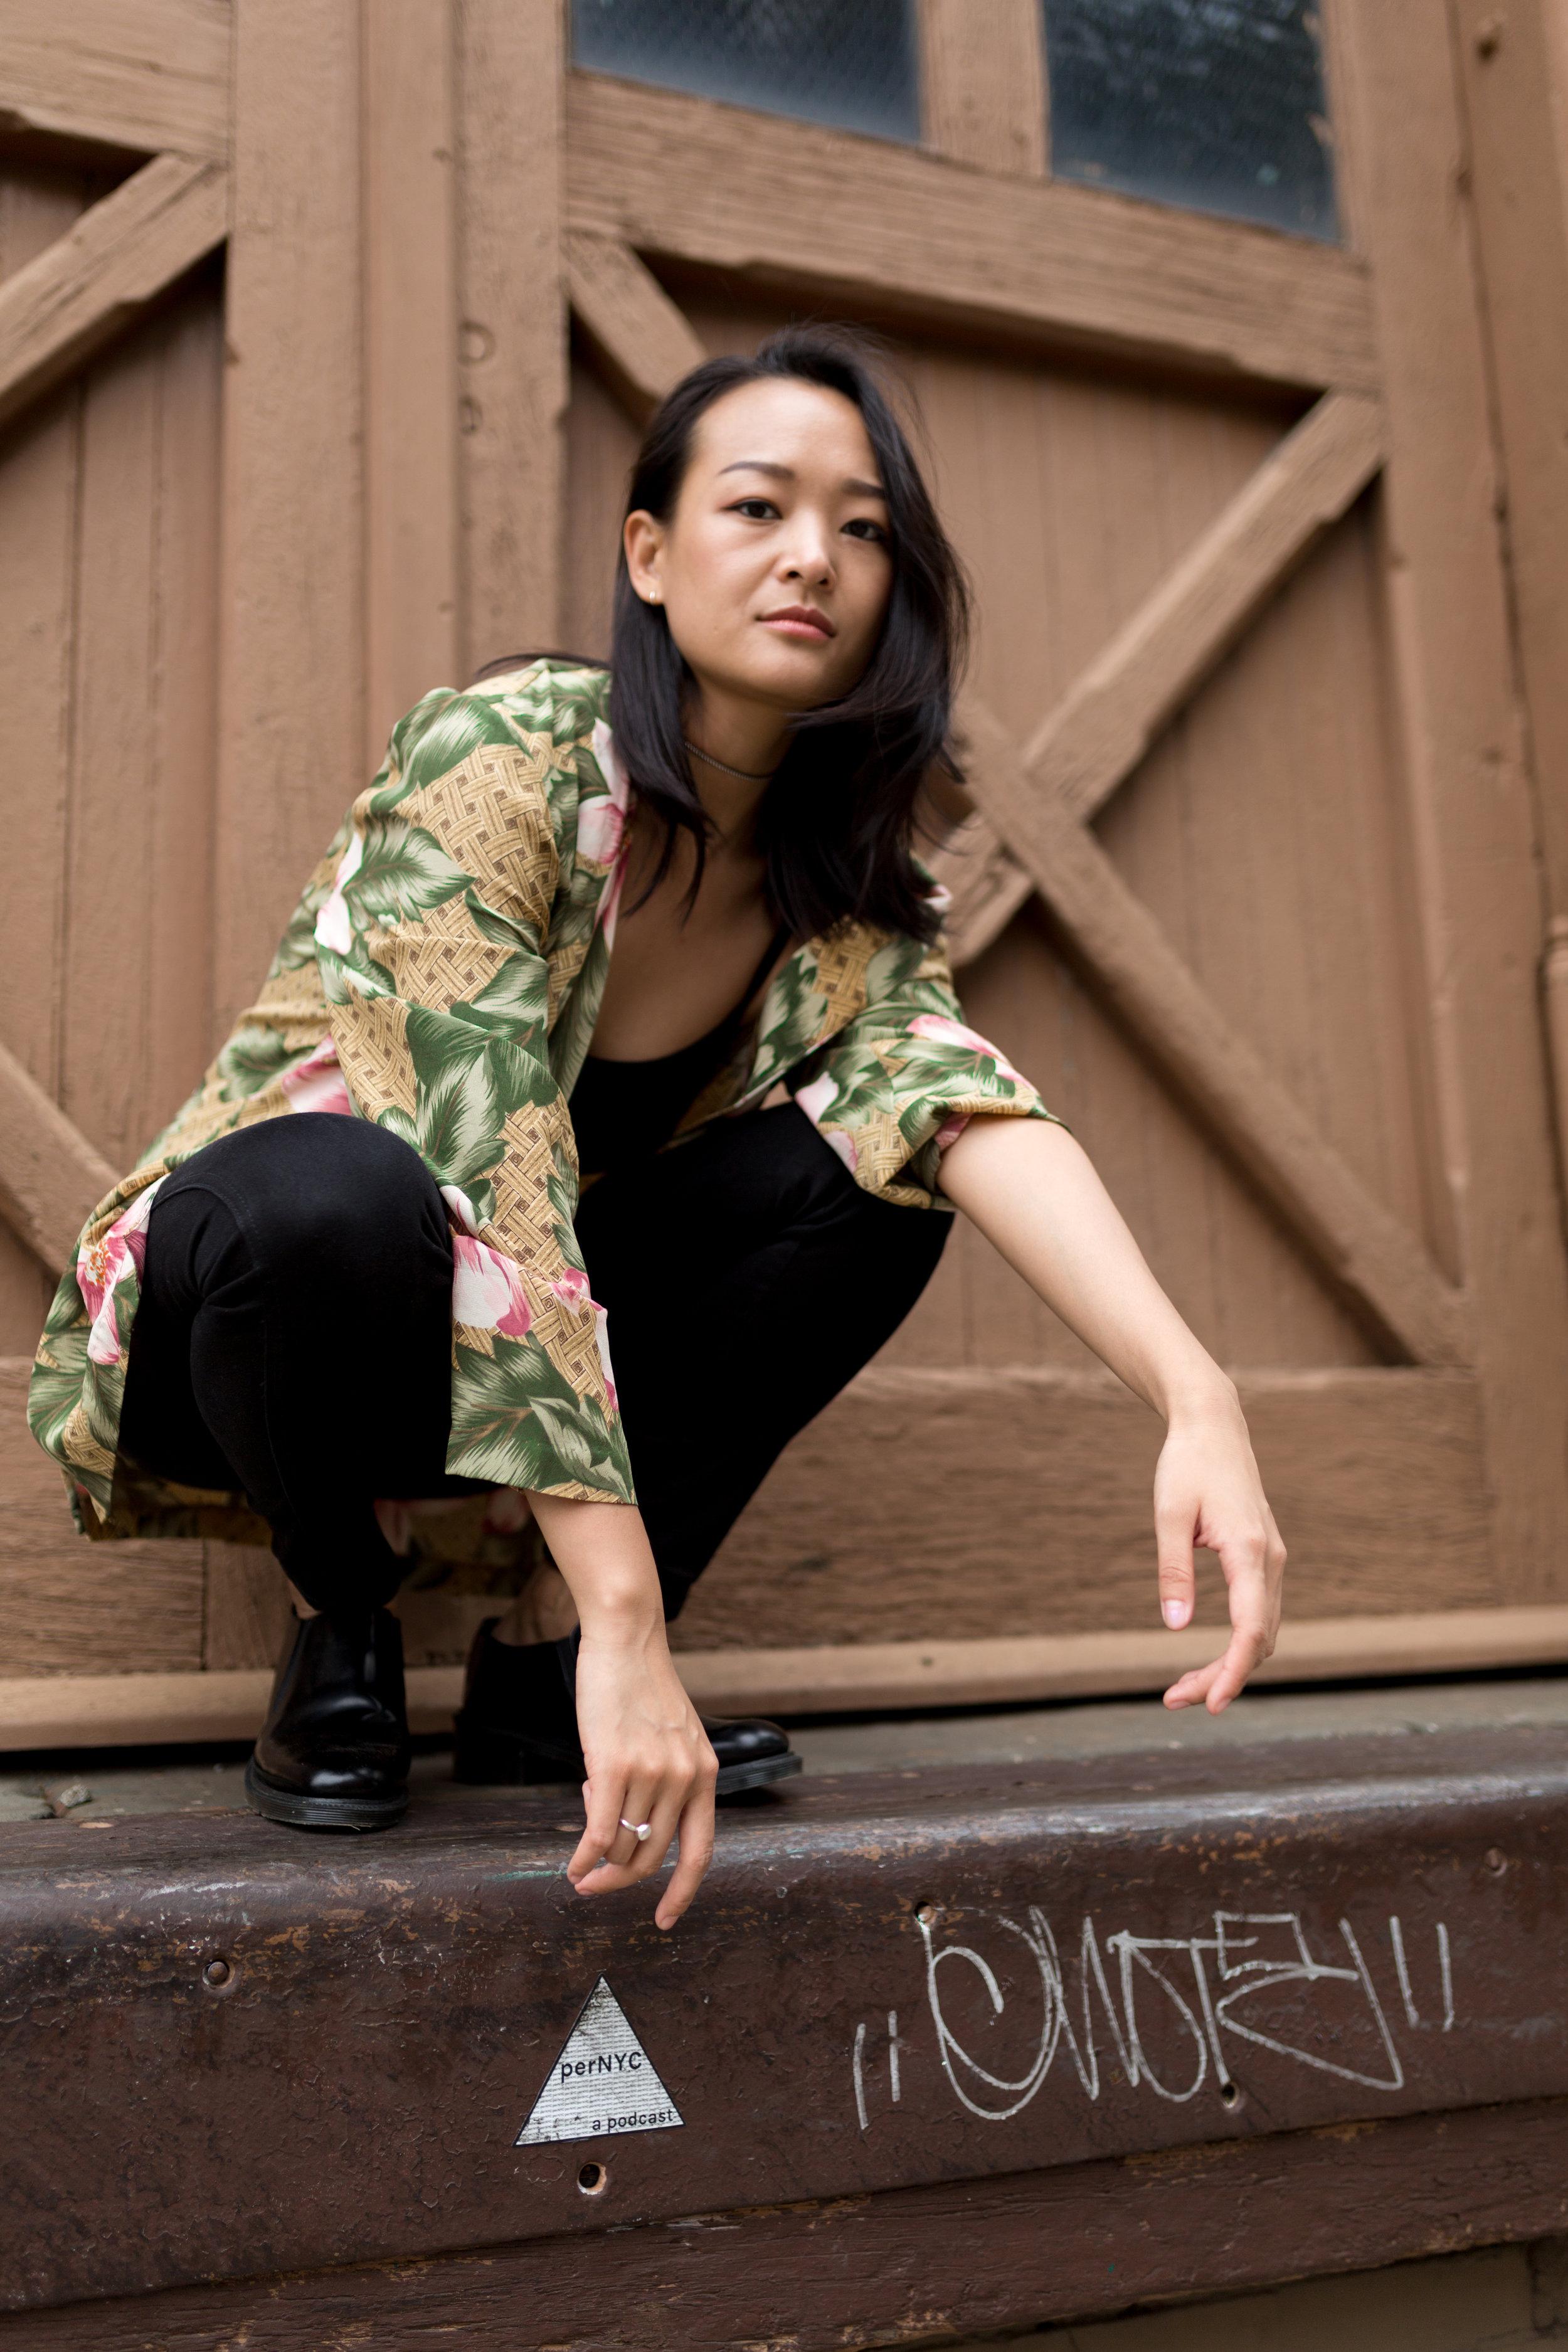 20170725-xiaojie86_by Winnie Lu.jpg